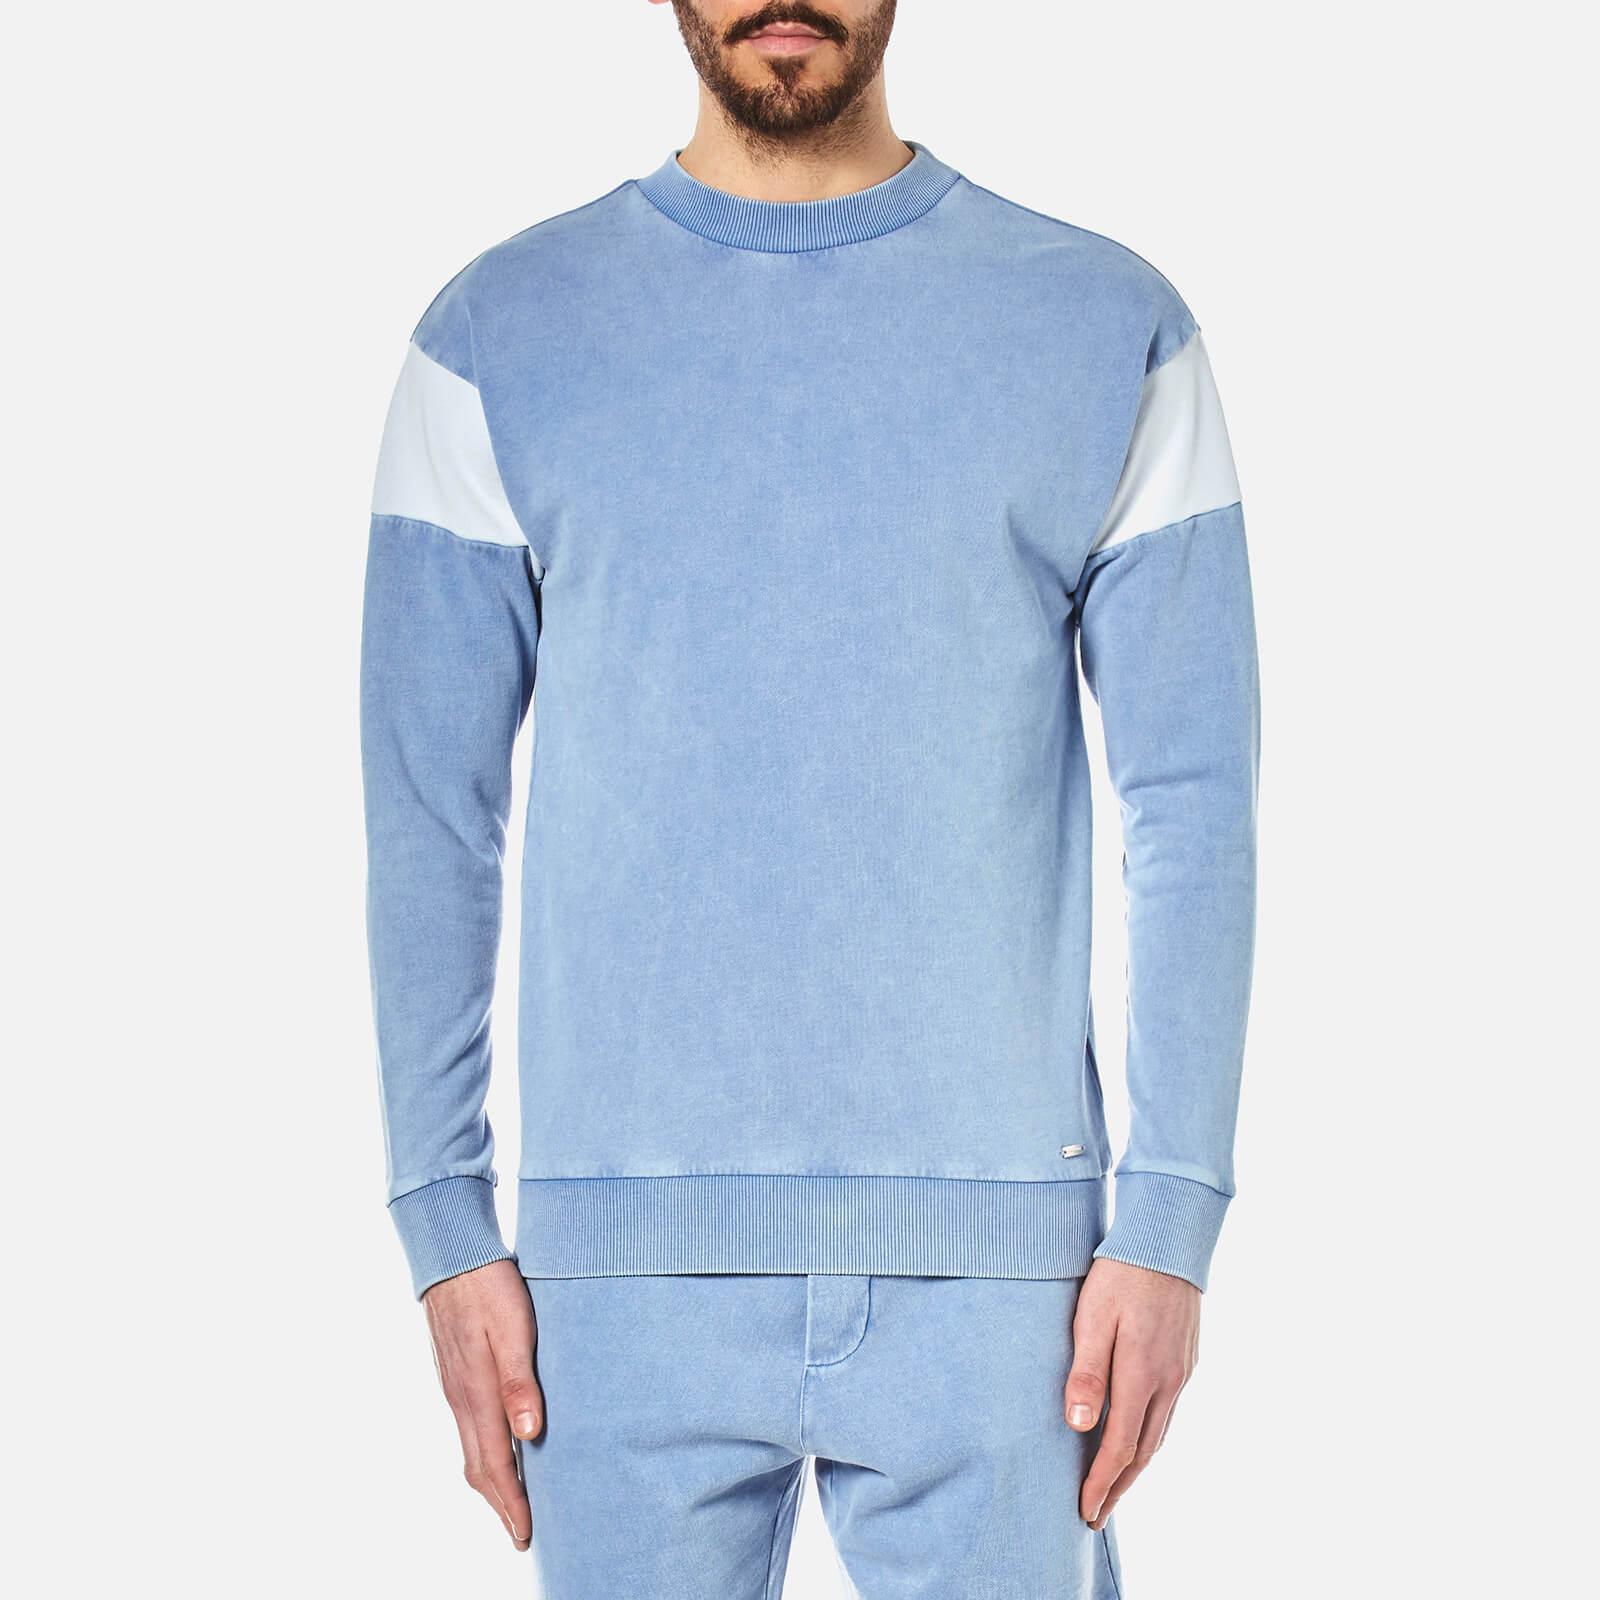 bec940ebb BOSS Orange Men's Wham Crew Neck Sweatshirt in Blue for Men - Lyst